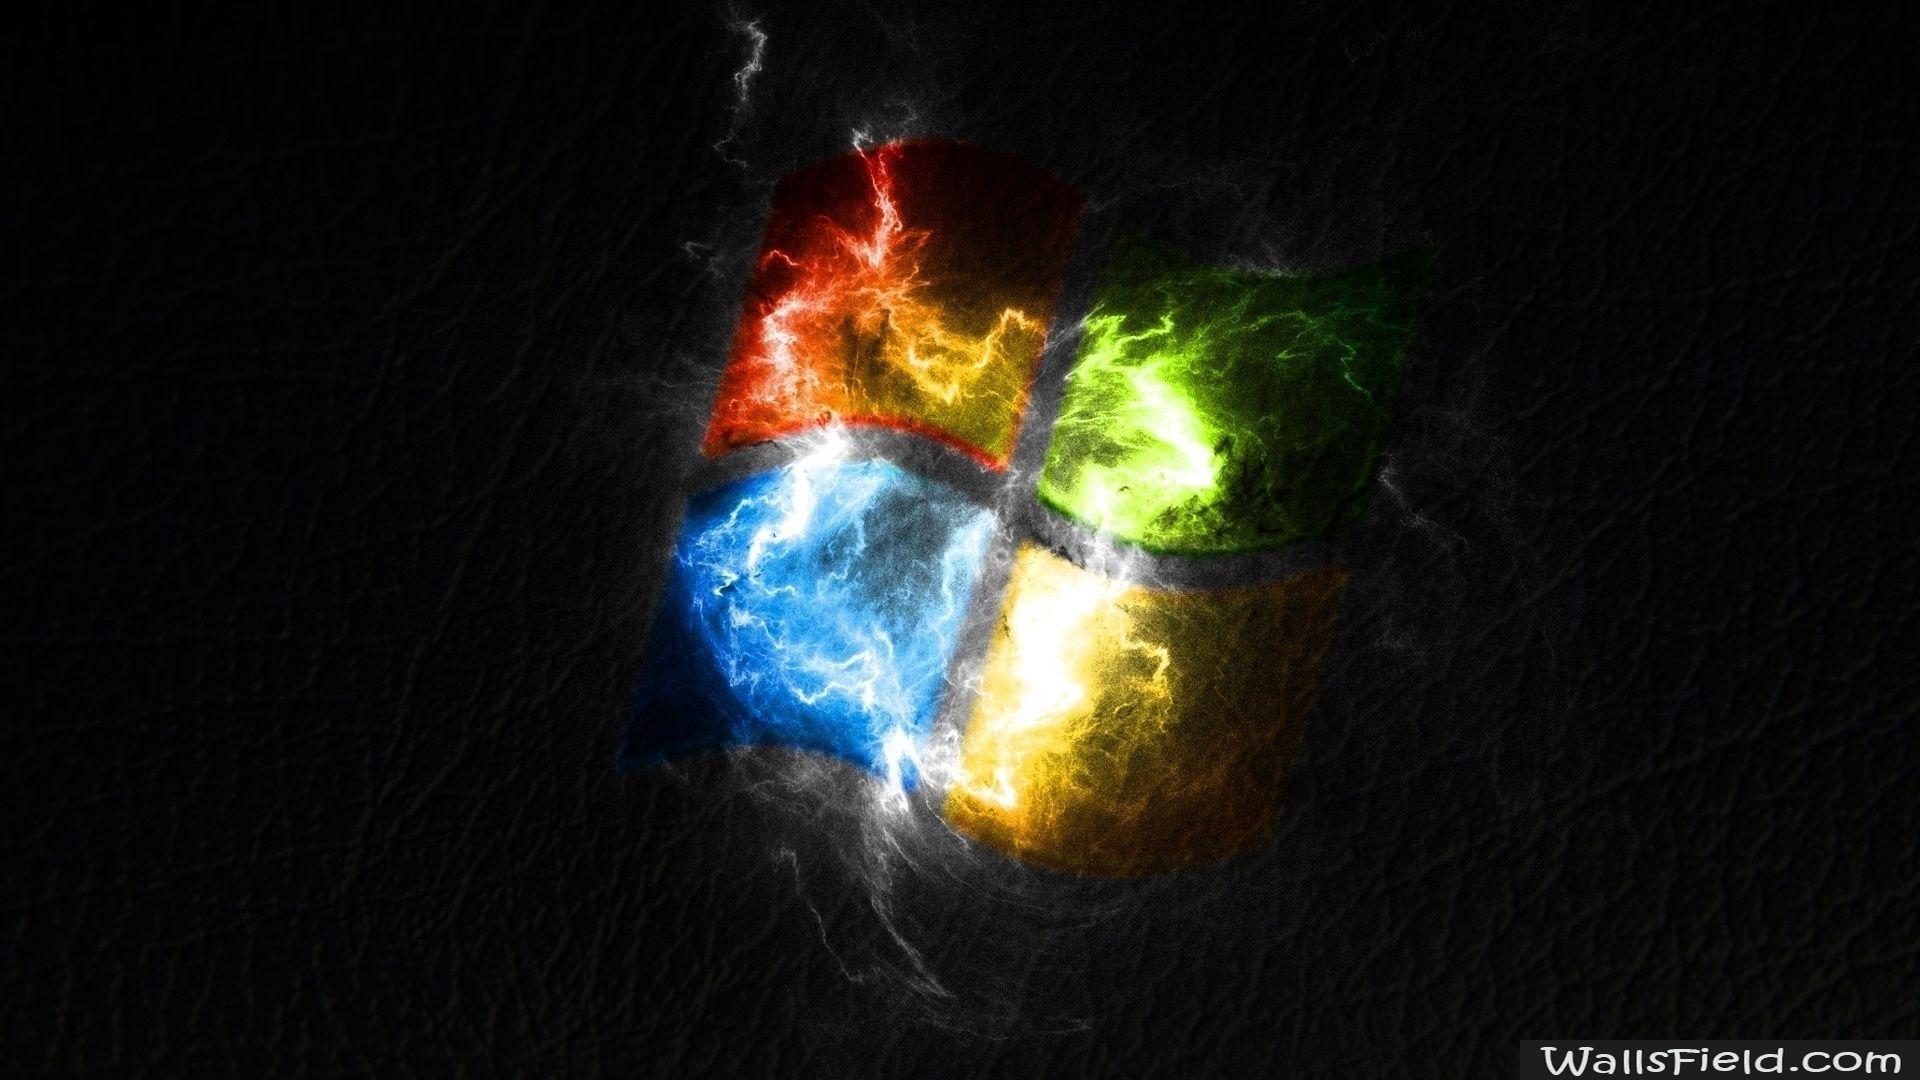 Creative Windows Logo Wallsfield Com Free Hd Wallpapers Wallpaper Windows Wallpaper Microsoft Wallpaper